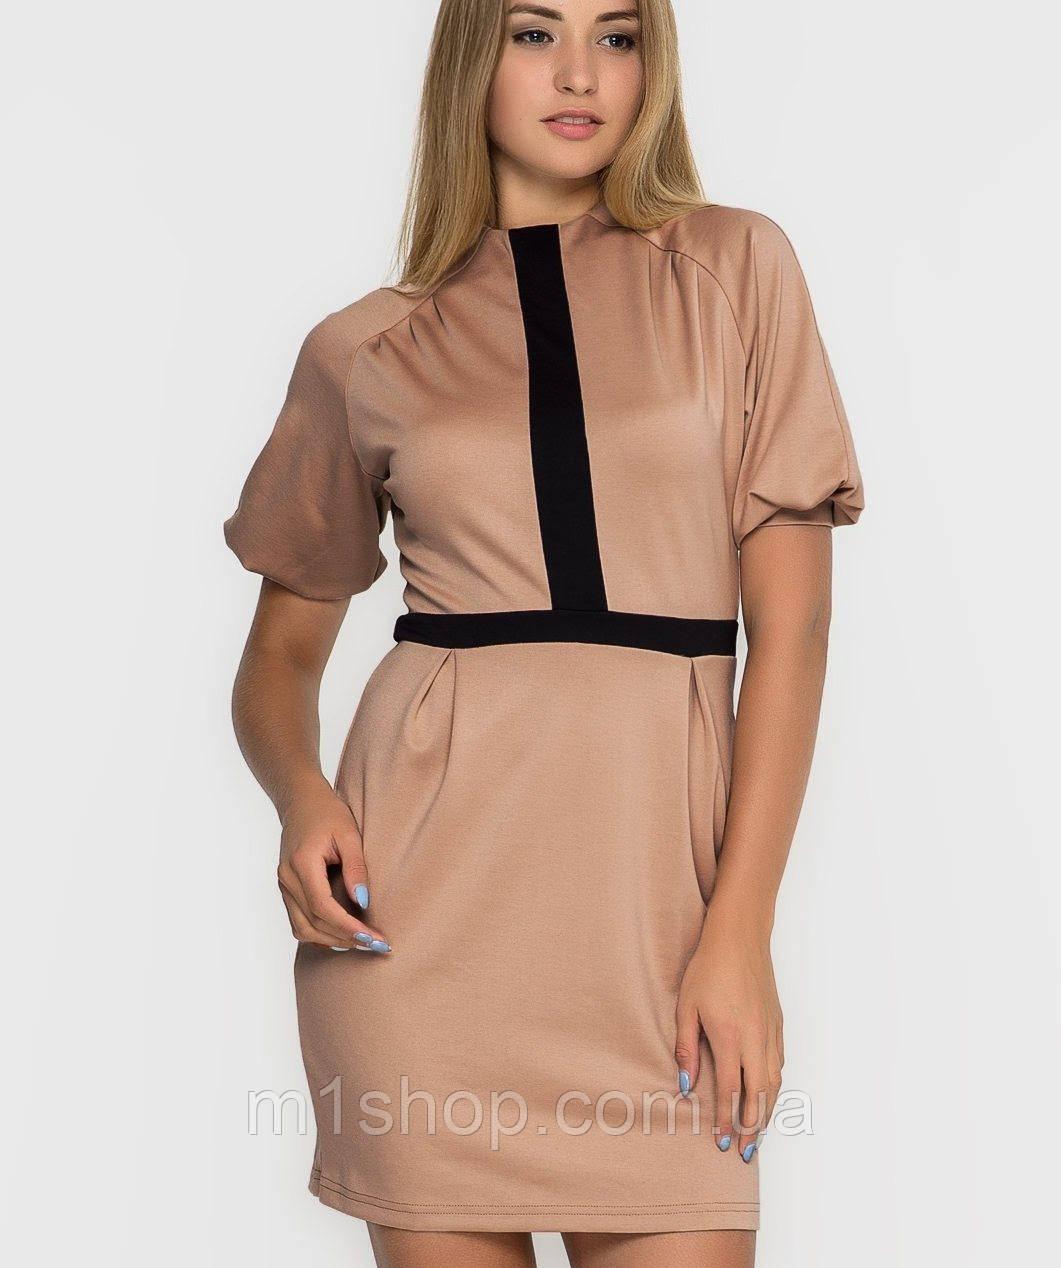 Женское платье с рукавом фонарик (2155 sk)